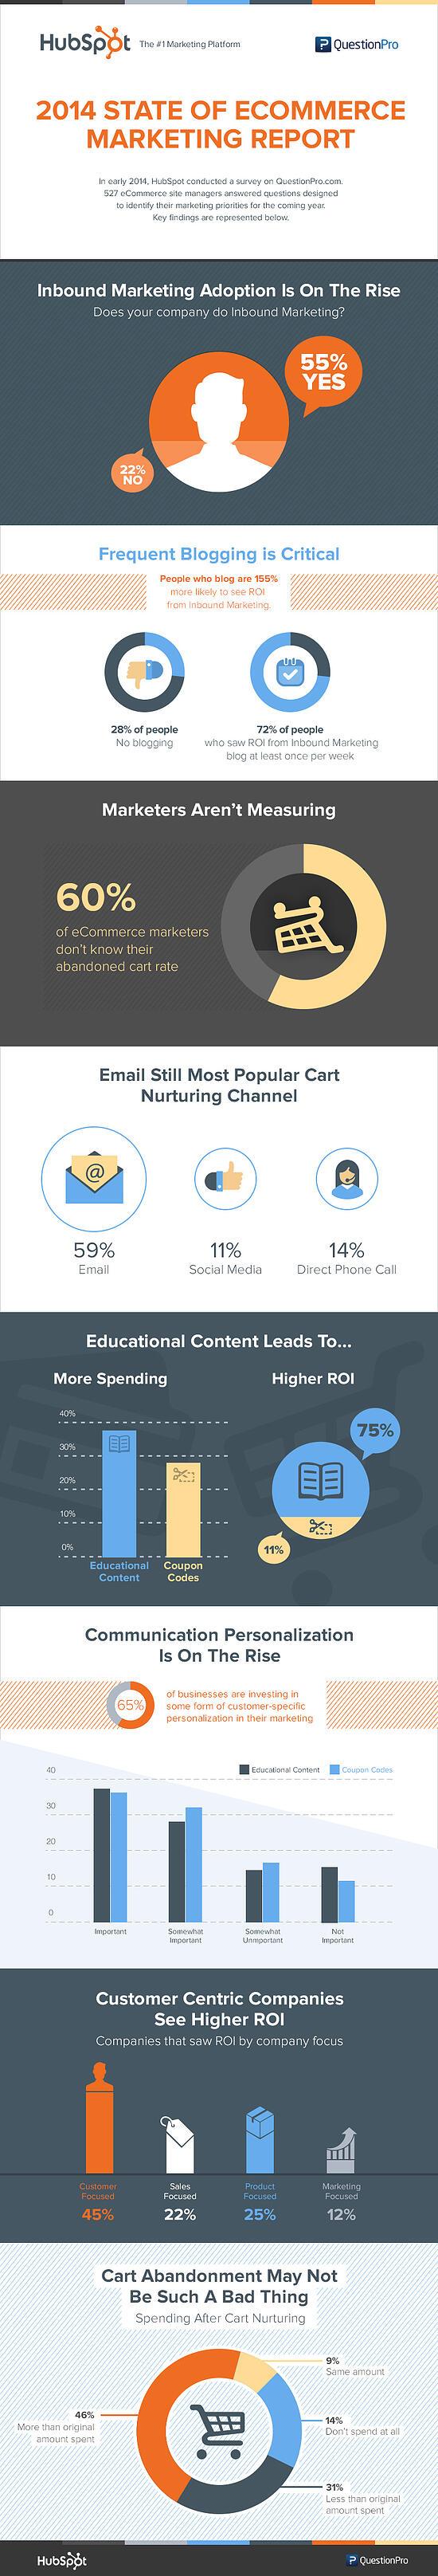 hubspot-ecommerce-marketing-infographic_(1)